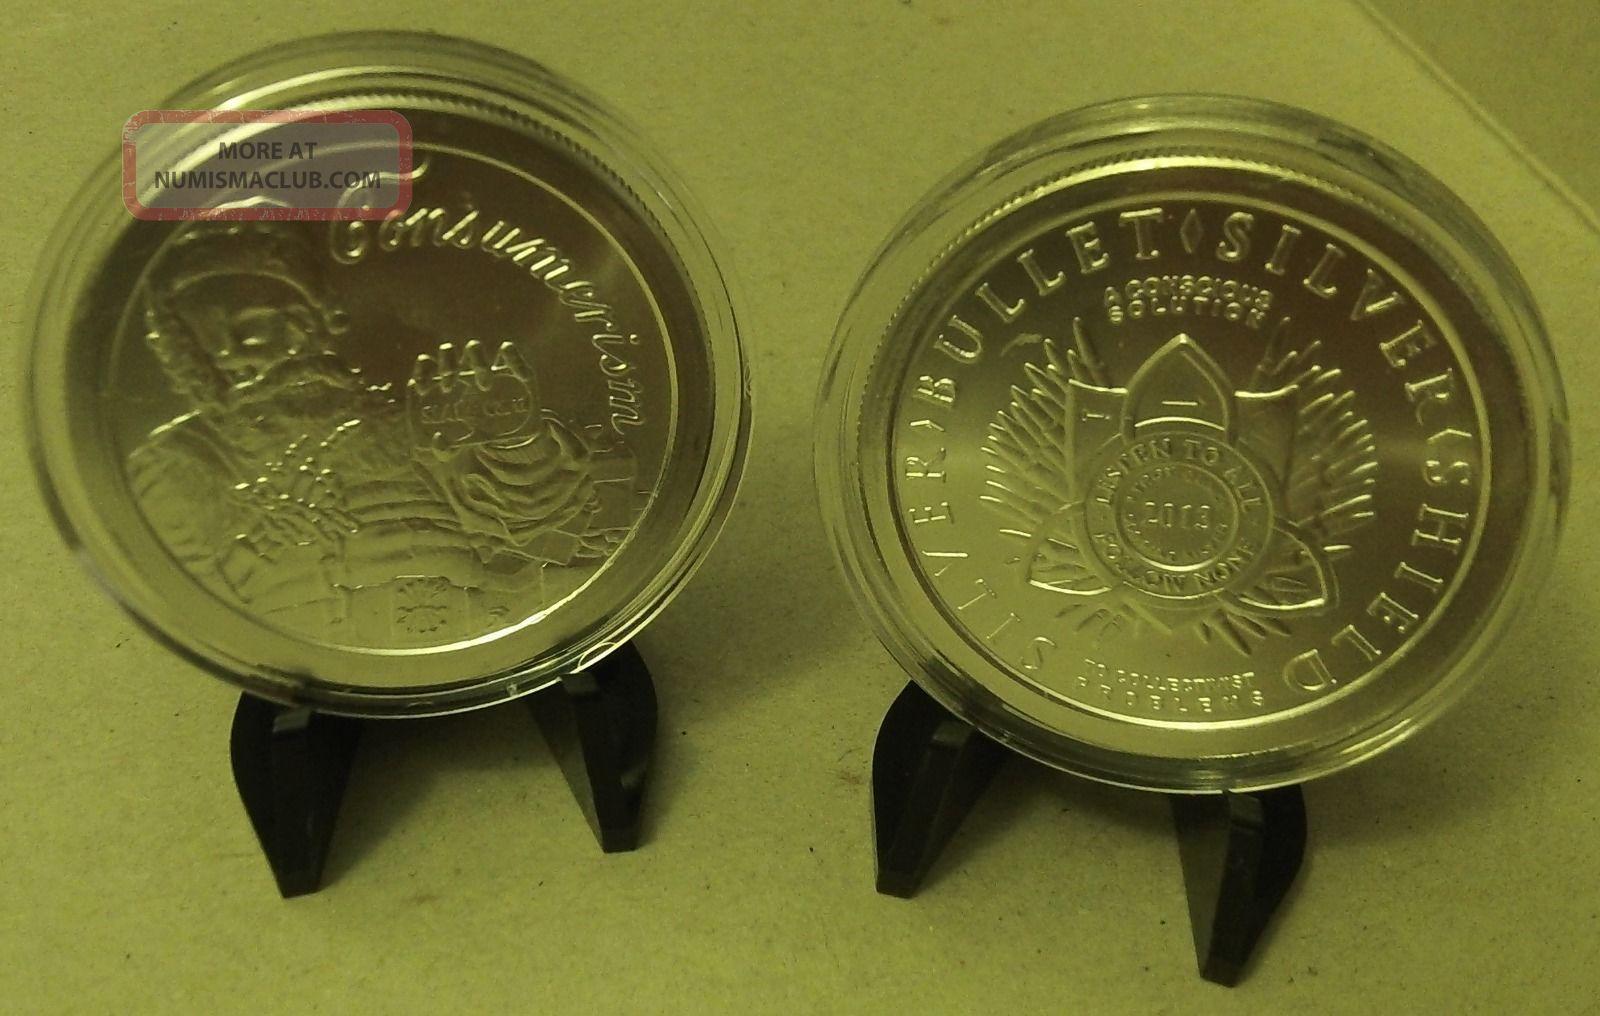 2013 Santa Slave Consumerism Christmas Medallion Silver